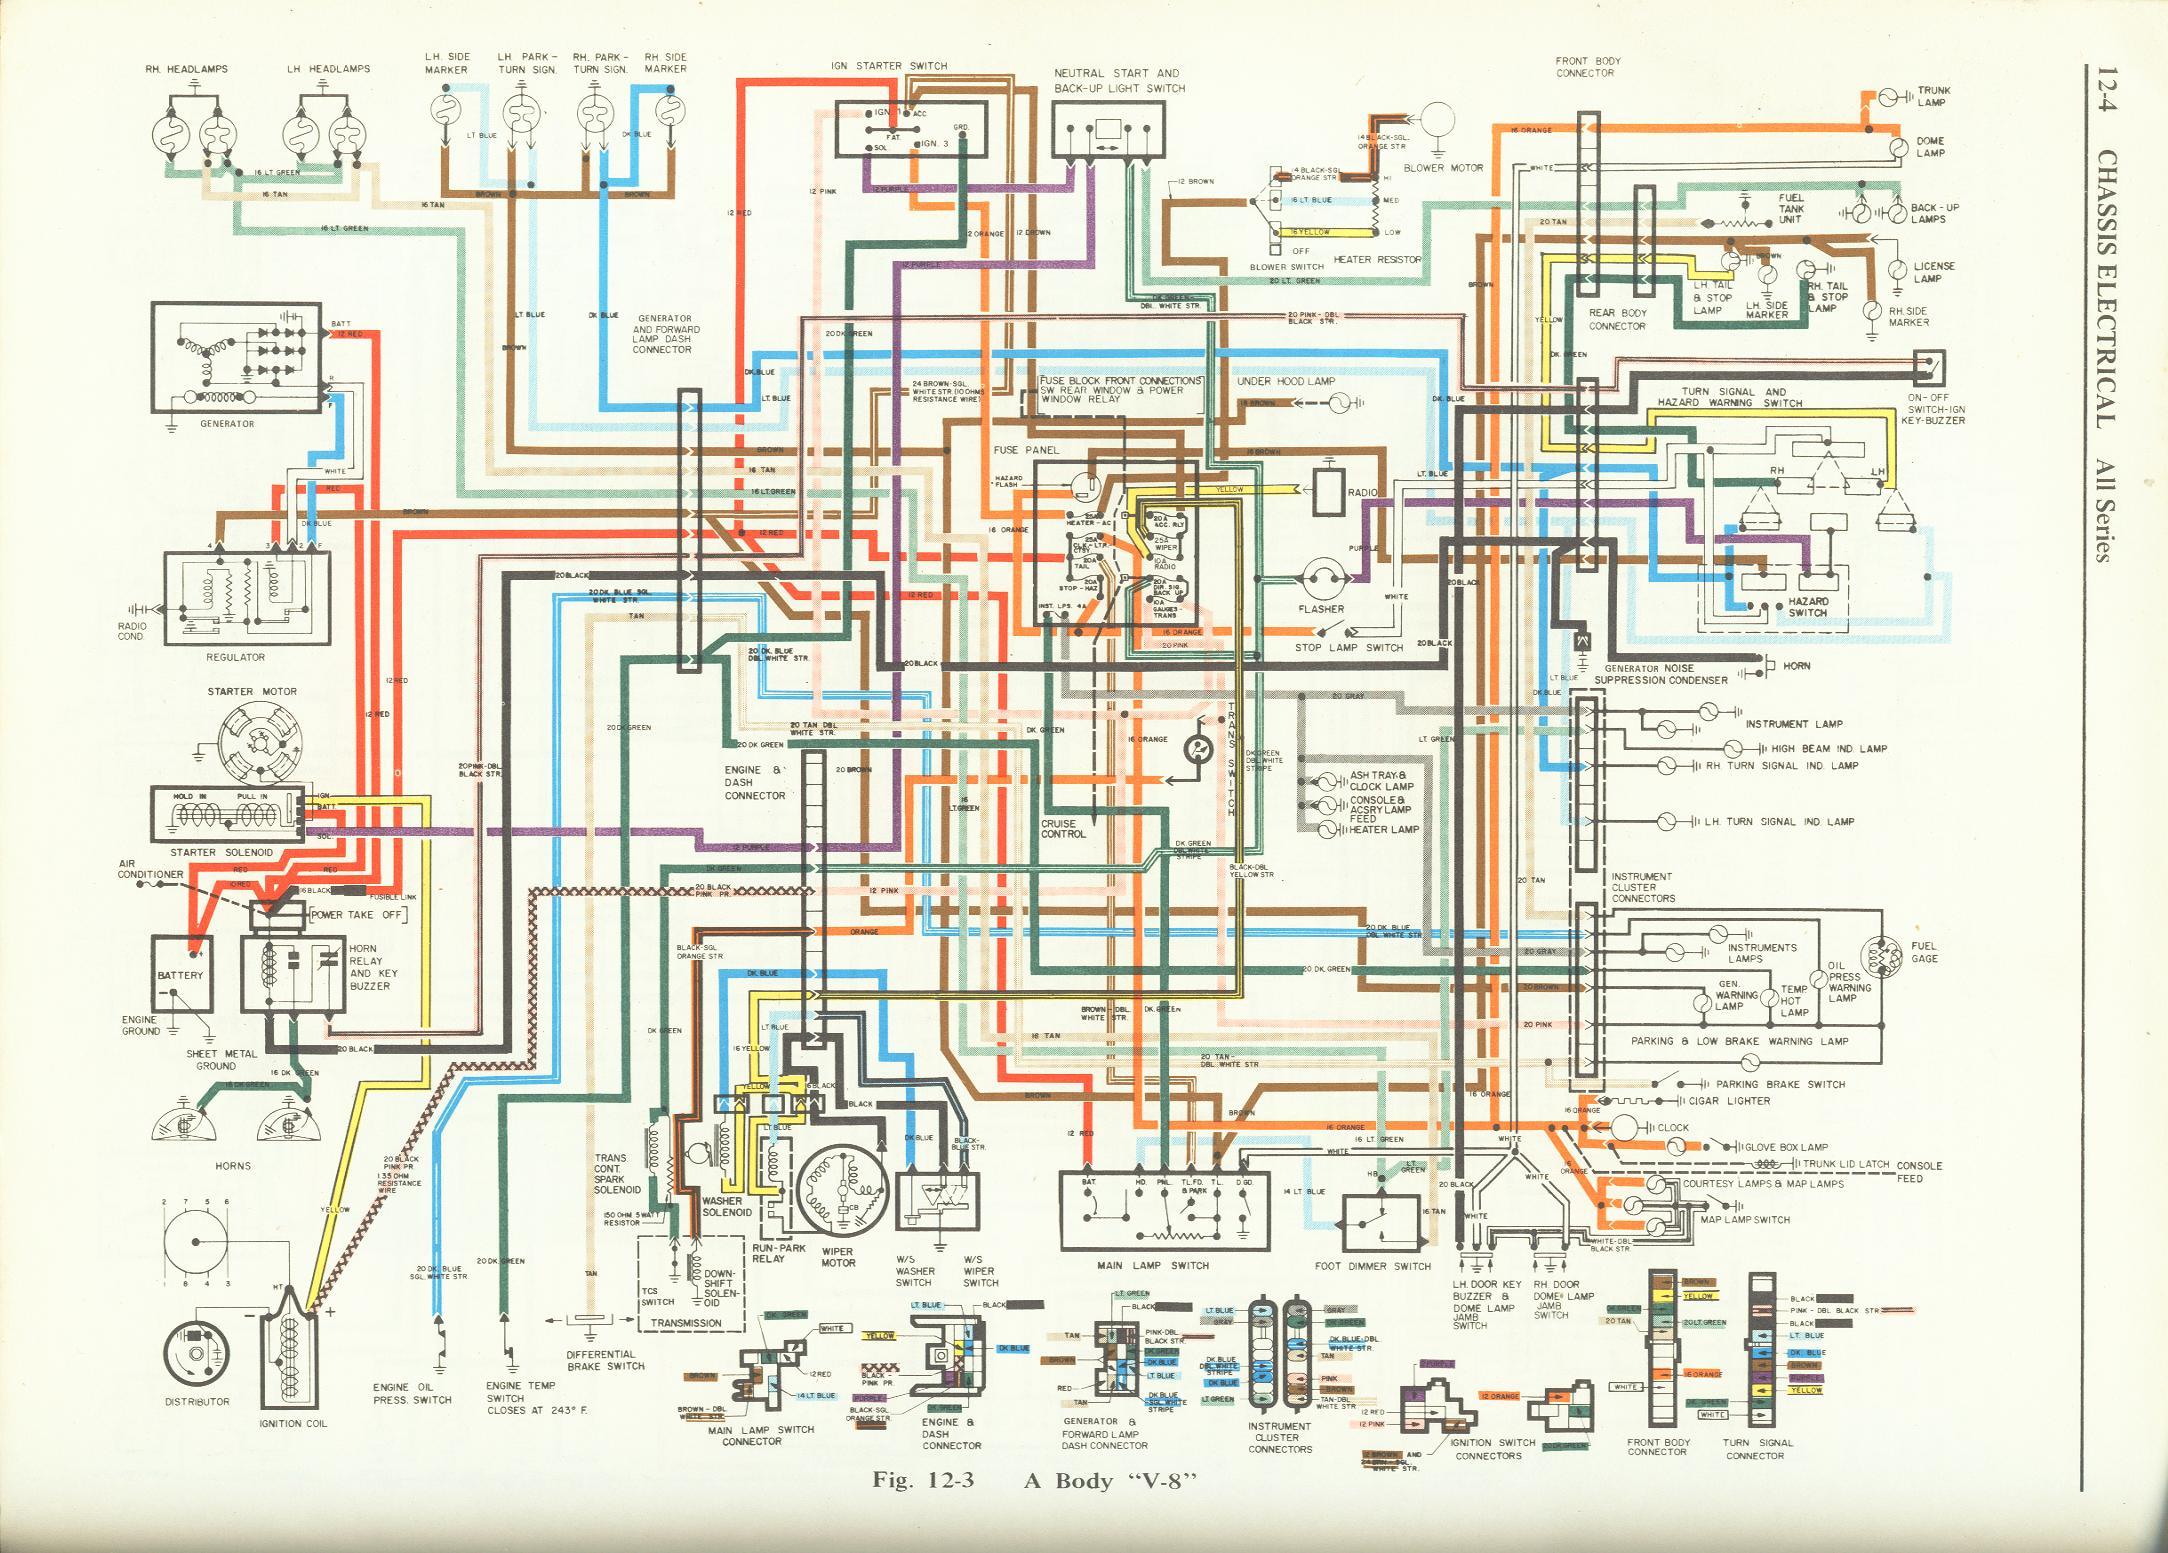 1976 Cutlass Wiring Diagram - Diagram Design Sources component-peace -  component-peace.nius-icbosa.itdiagram database - nius-icbosa.it